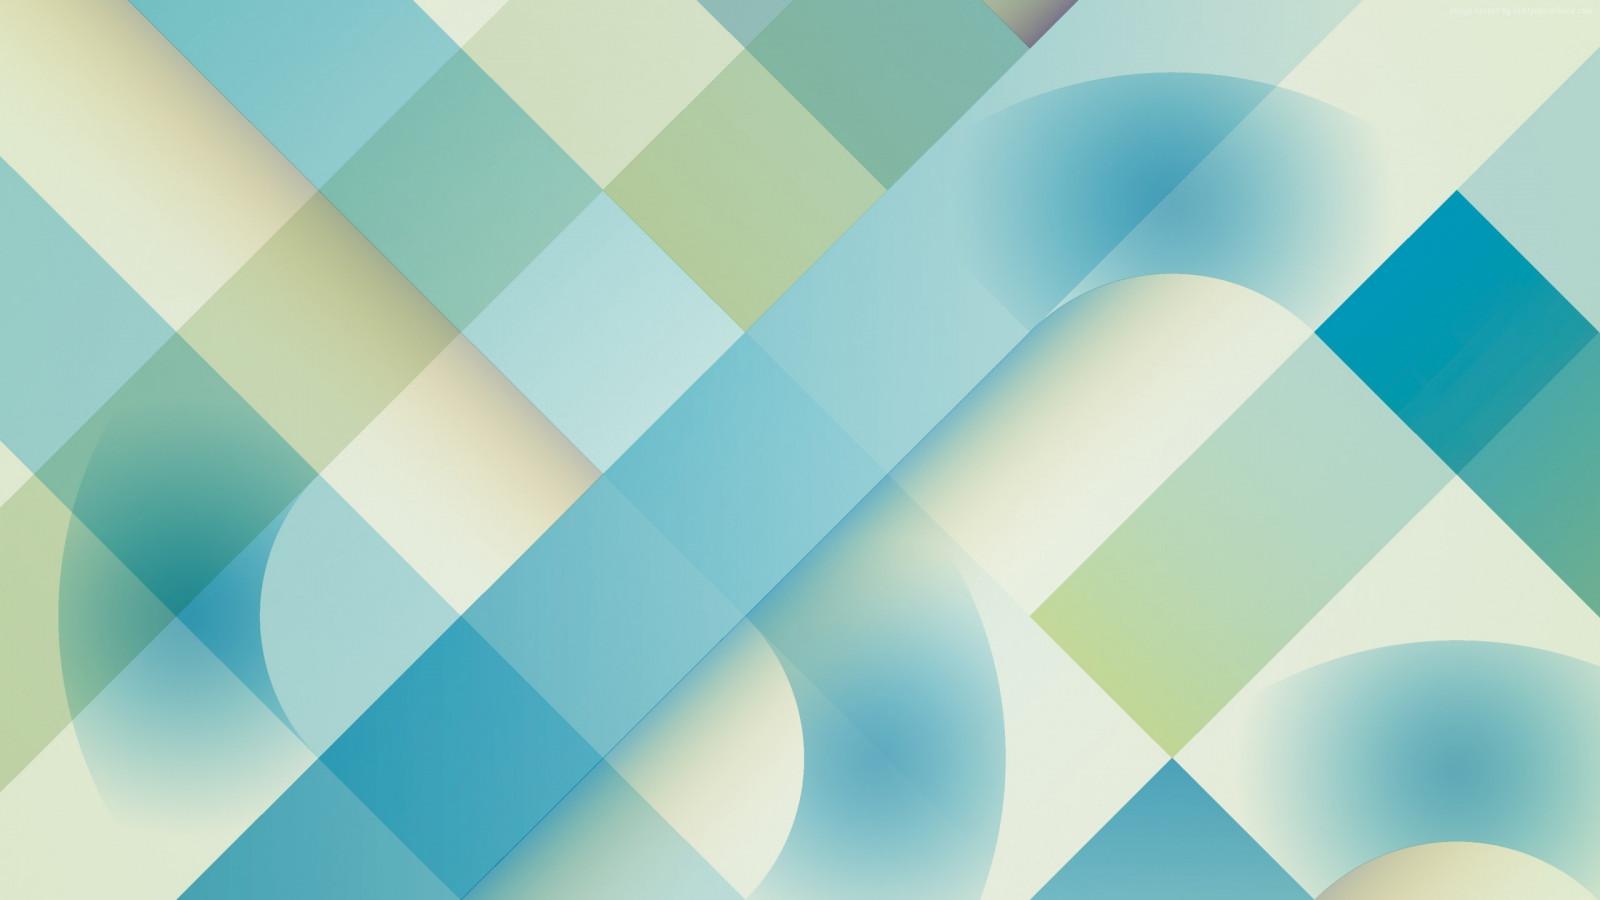 Wallpaper ilustrasi abstrak karya seni simetri hijau